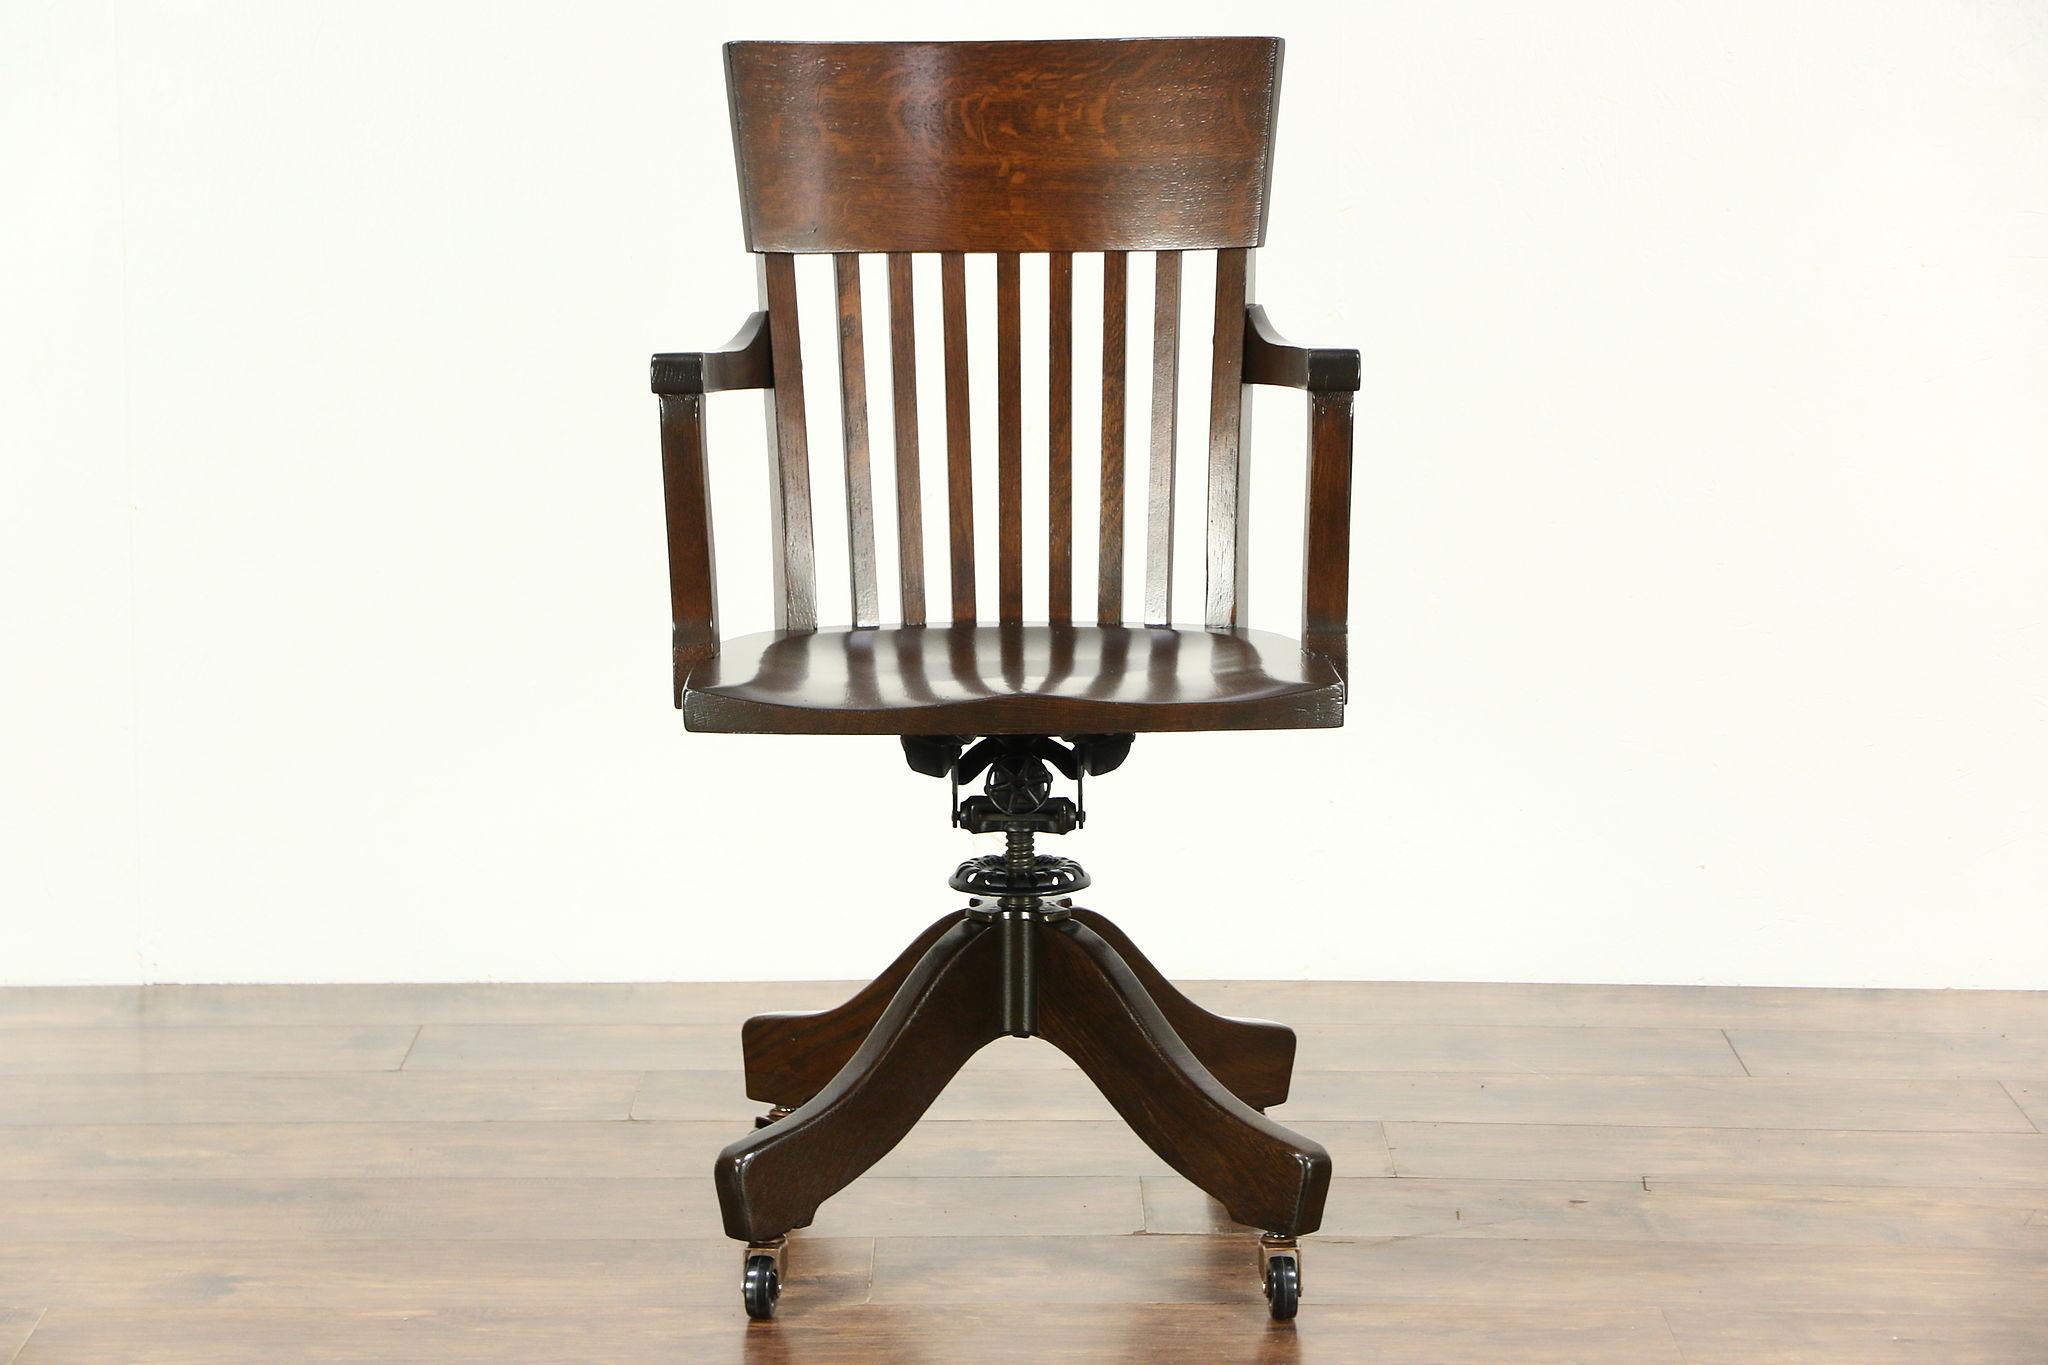 antique swivel office chair. Oak 1915 Antique Swivel Adjustable Desk Chair, Signed Johnson, Office Chair H